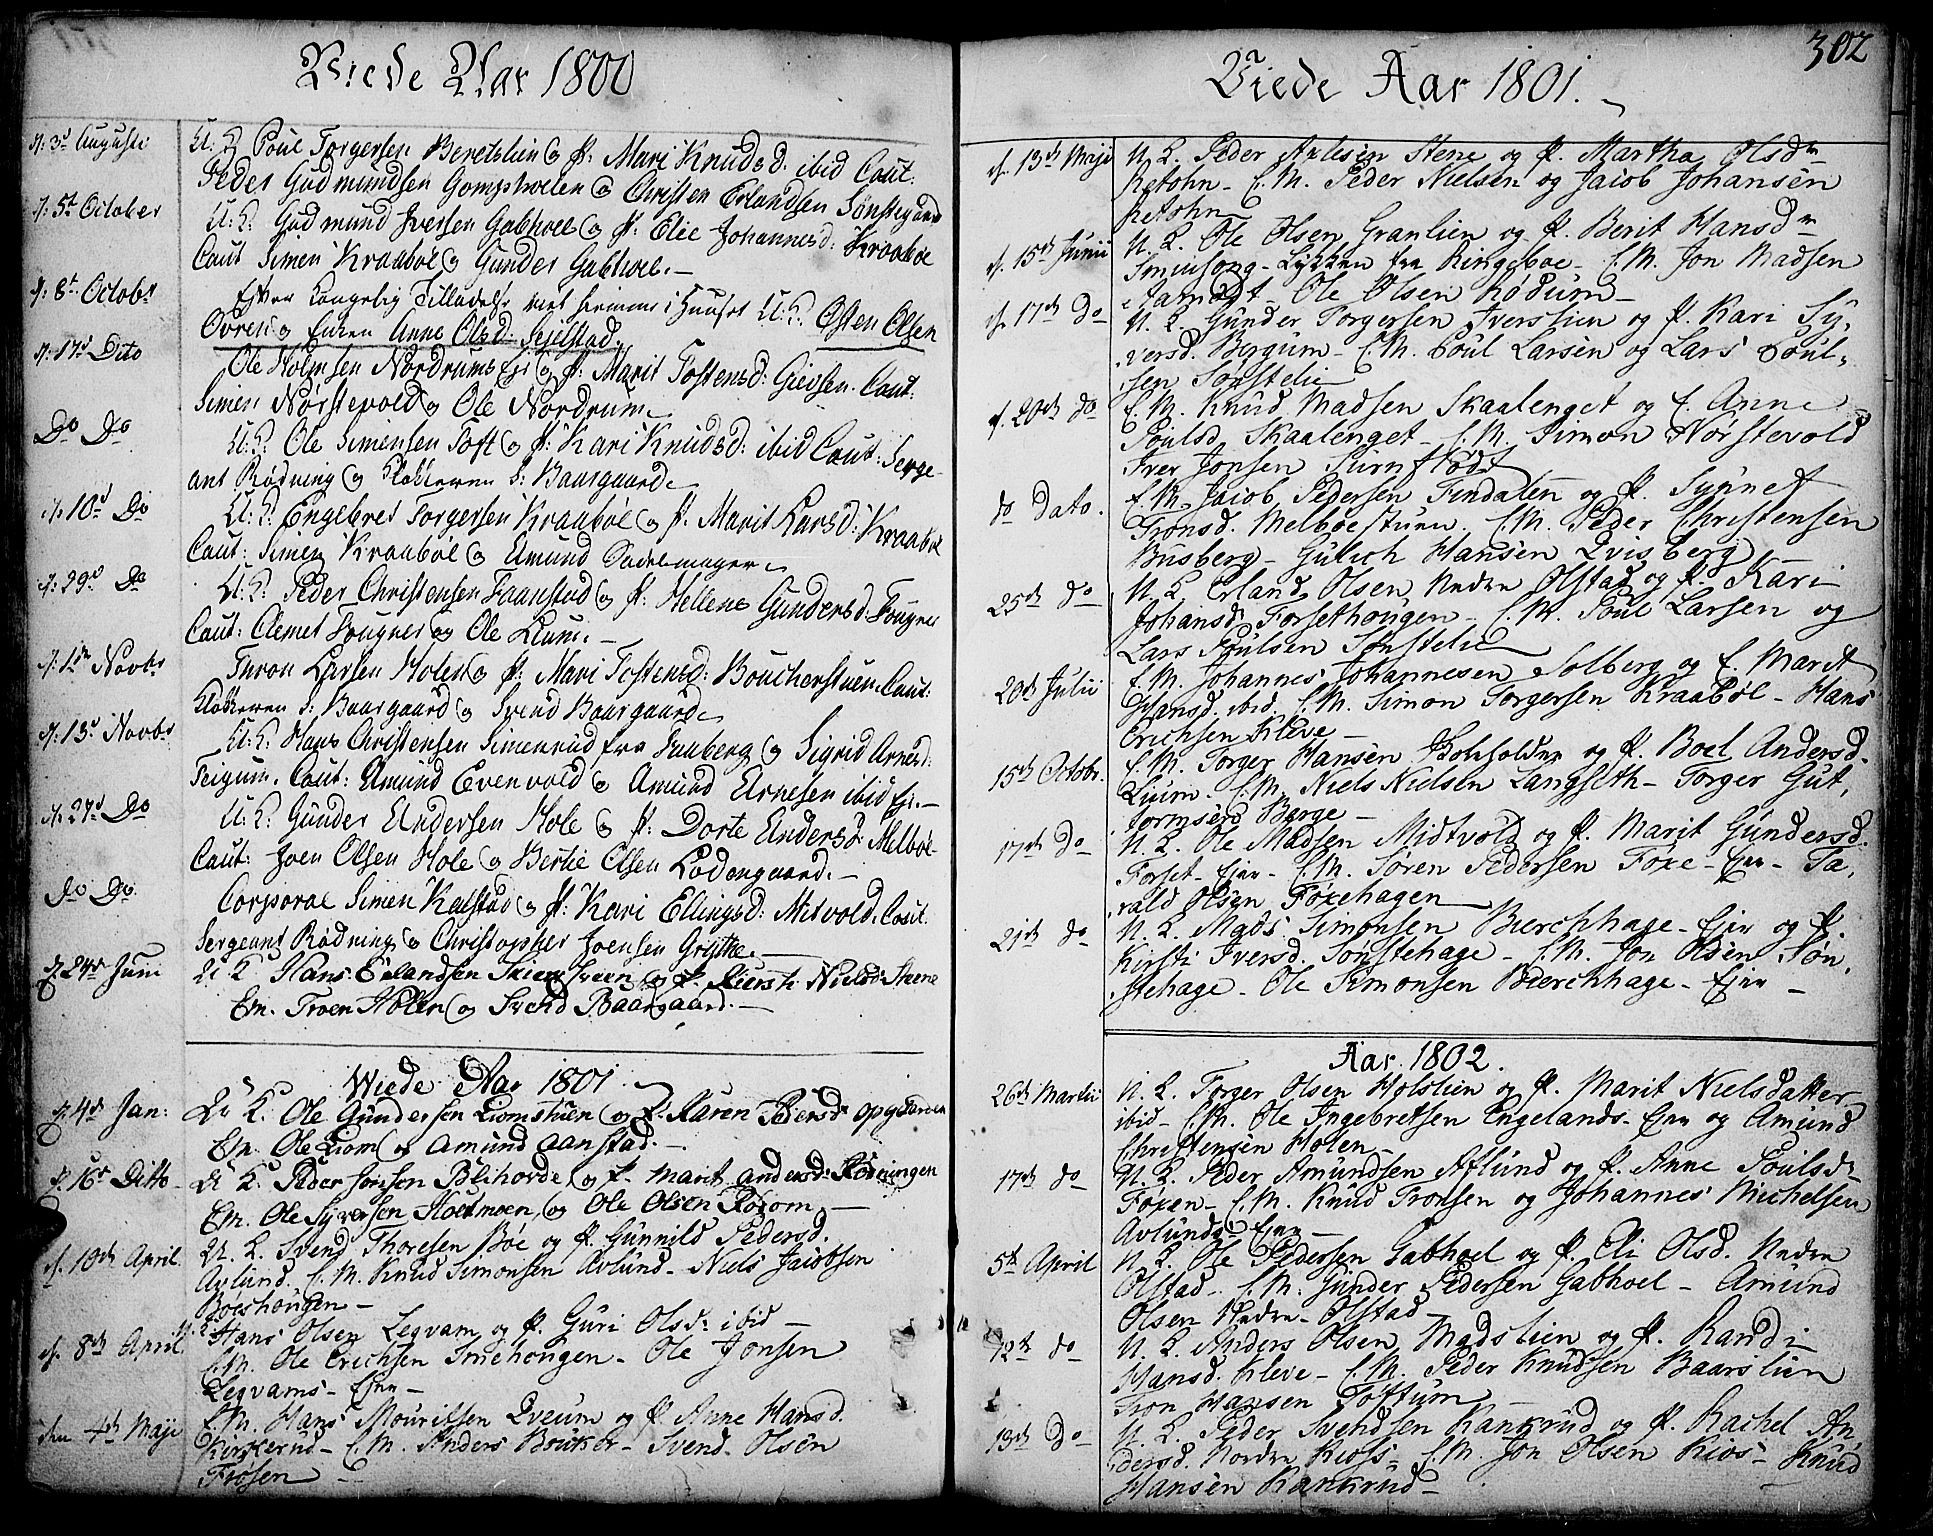 SAH, Gausdal prestekontor, Ministerialbok nr. 3, 1758-1809, s. 302